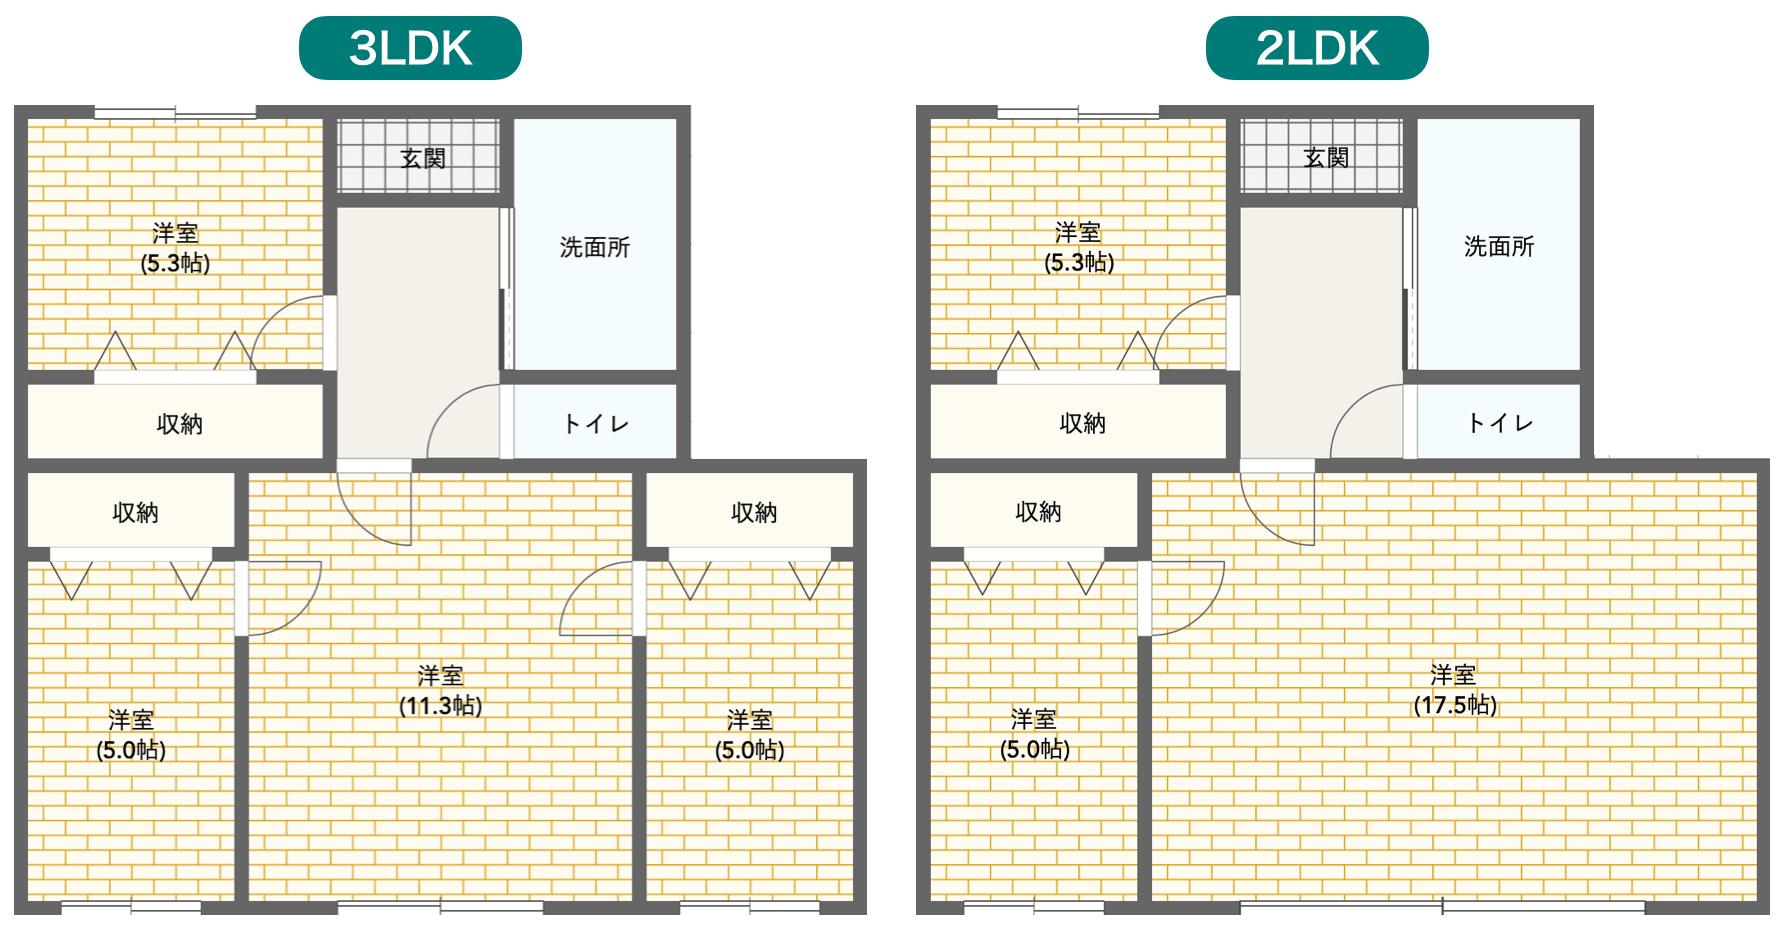 3LDKと2LDKの間取り図比較